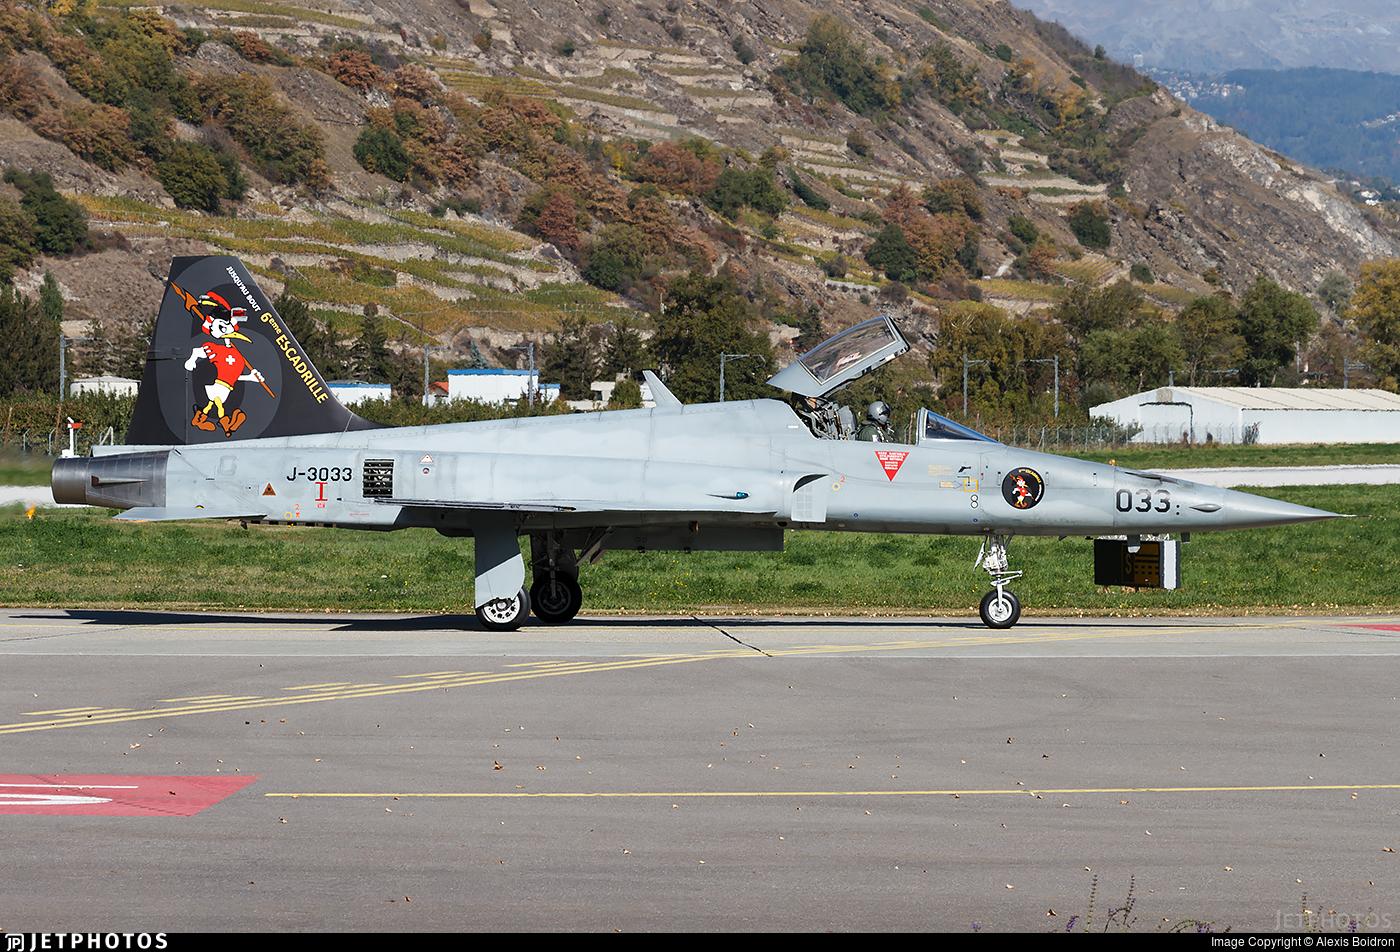 J-3033 - Northrop F-5E Tiger II - Switzerland - Air Force